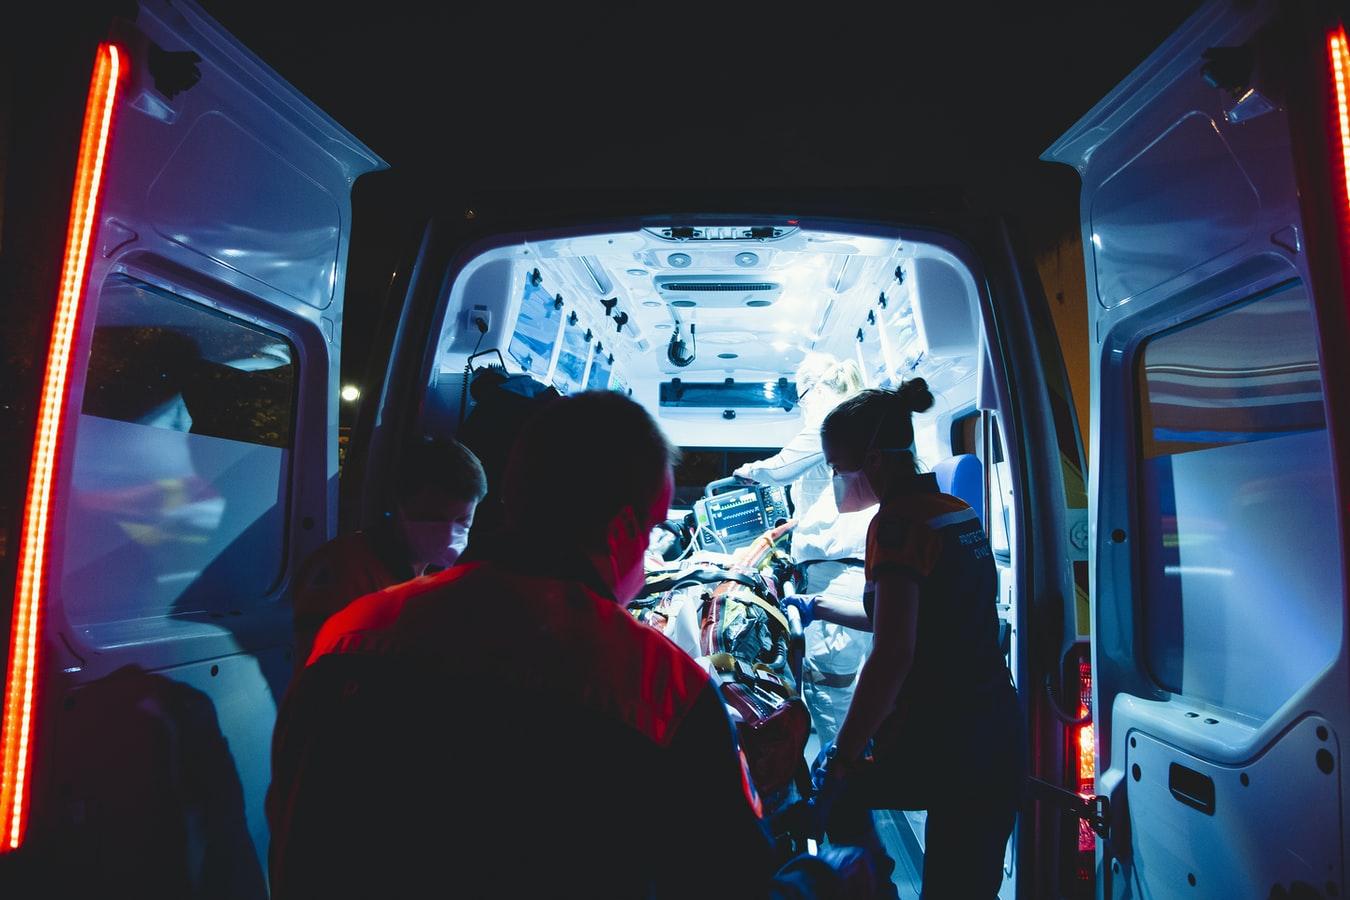 arrêt-cardio-respiratoire-paramedics-canada-ambulancier-le-site-de-reference